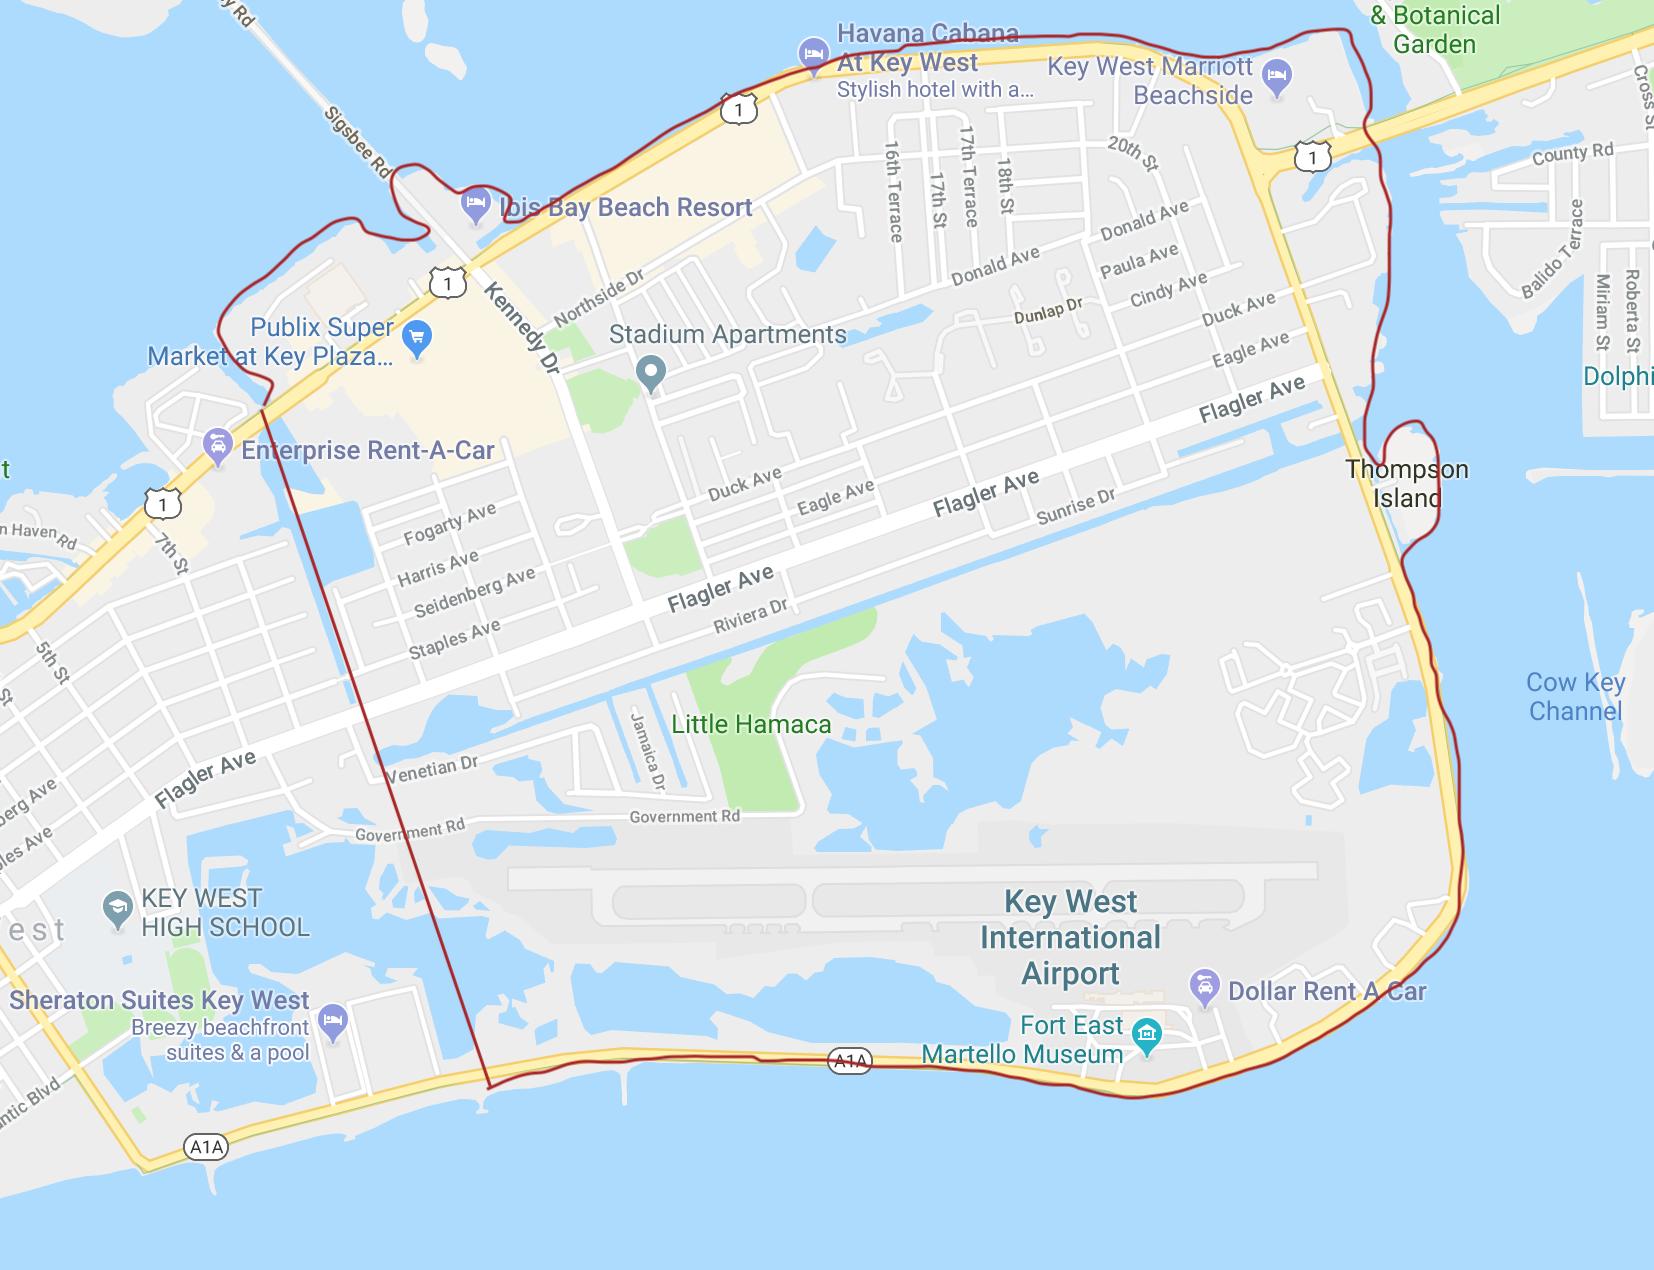 Key West On World Map on darien on world map, cincinnati on world map, clermont on world map, cozumel mexico on world map, new brunswick on world map, minneapolis on world map, grenada on world map, cancun mexico on world map, acadia national park on world map, port-au-prince on world map, belize city on world map, port of spain on world map, st. lawrence seaway on world map, da nang on world map, jost van dyke on world map, norfolk on world map, calais on world map, arenal volcano on world map, recife on world map, lake okeechobee on world map,